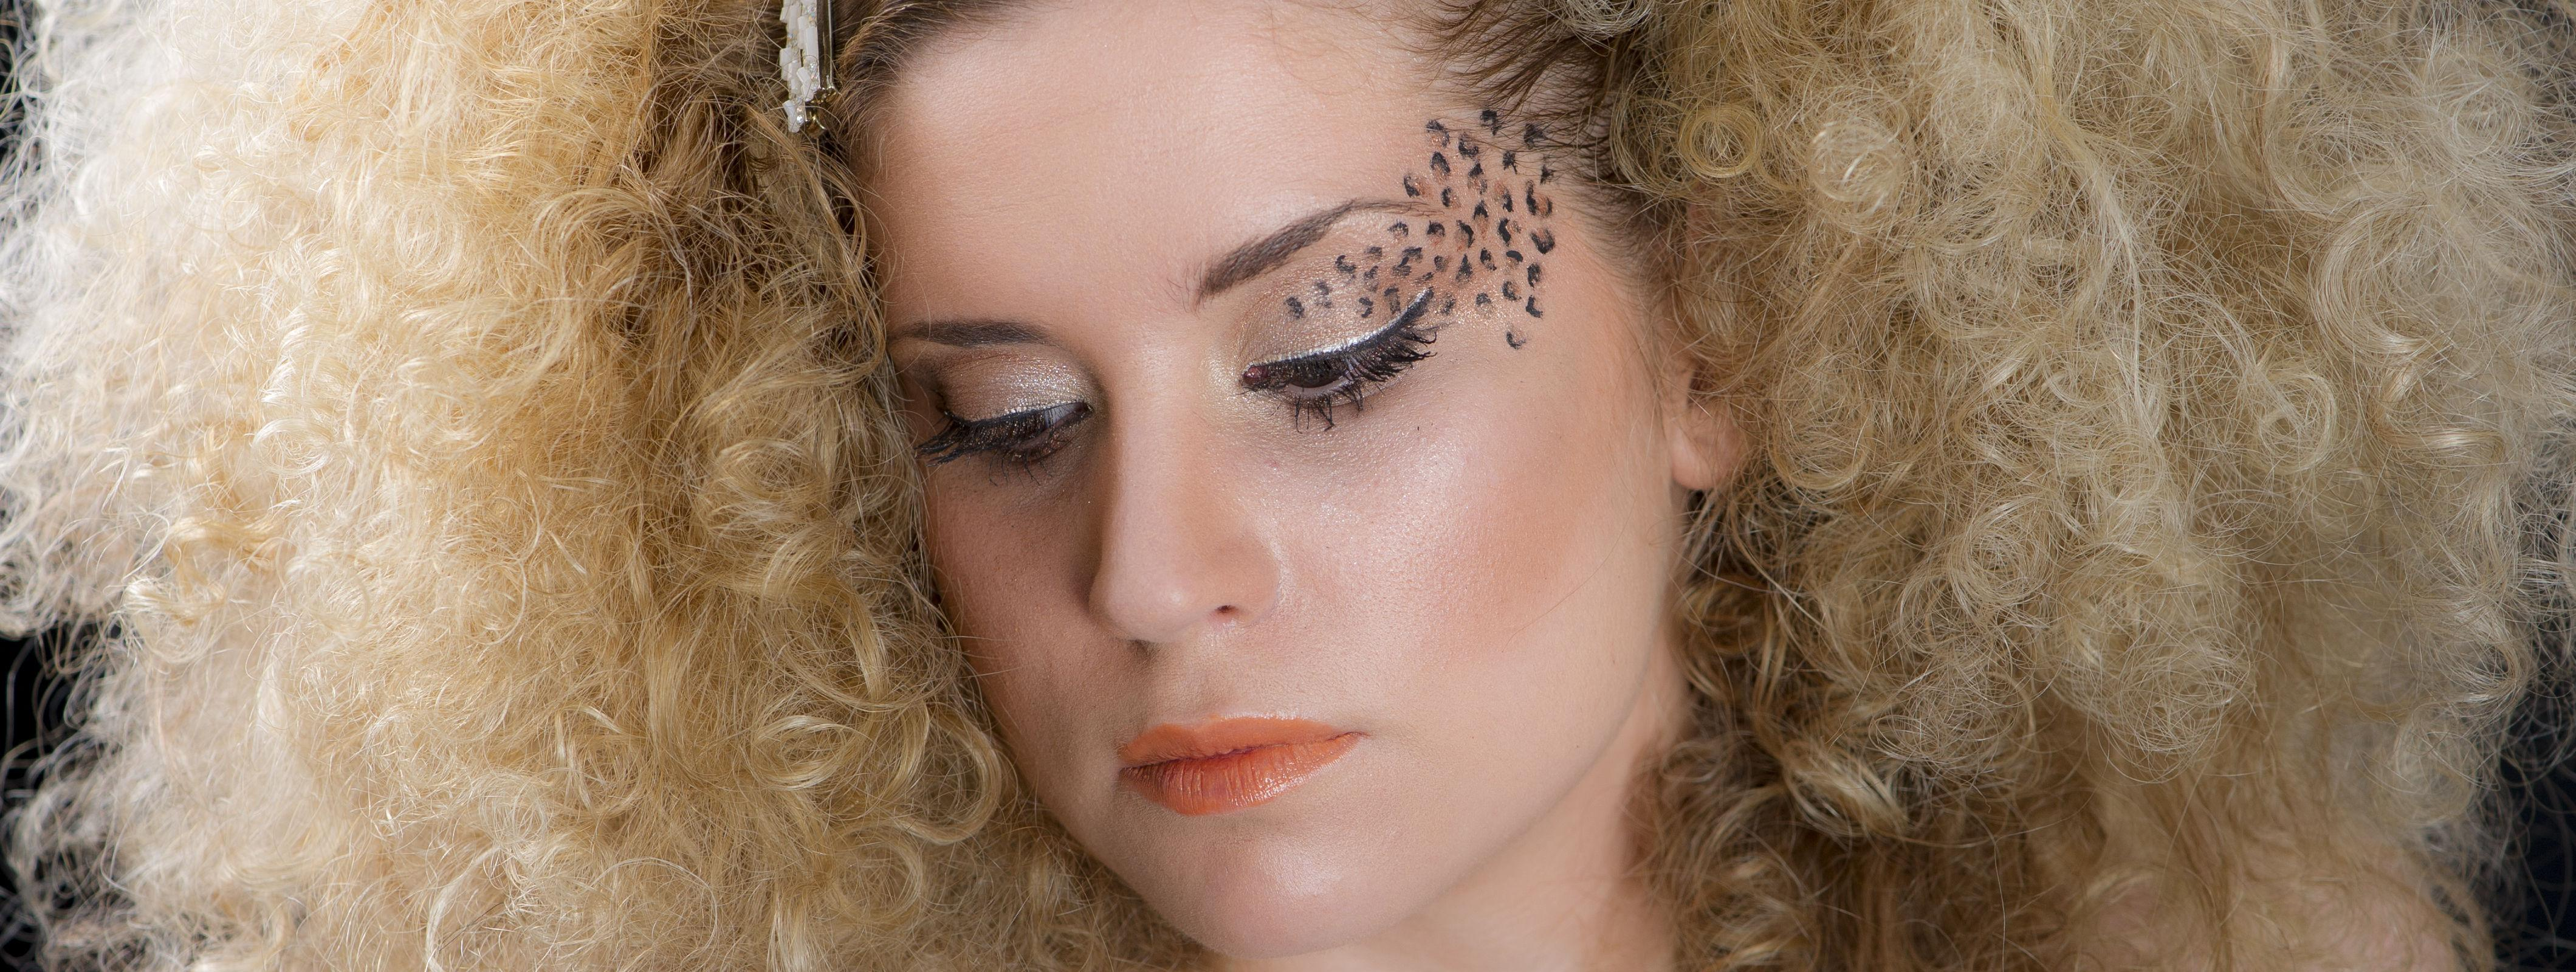 Peinados y Maquillajes 2014